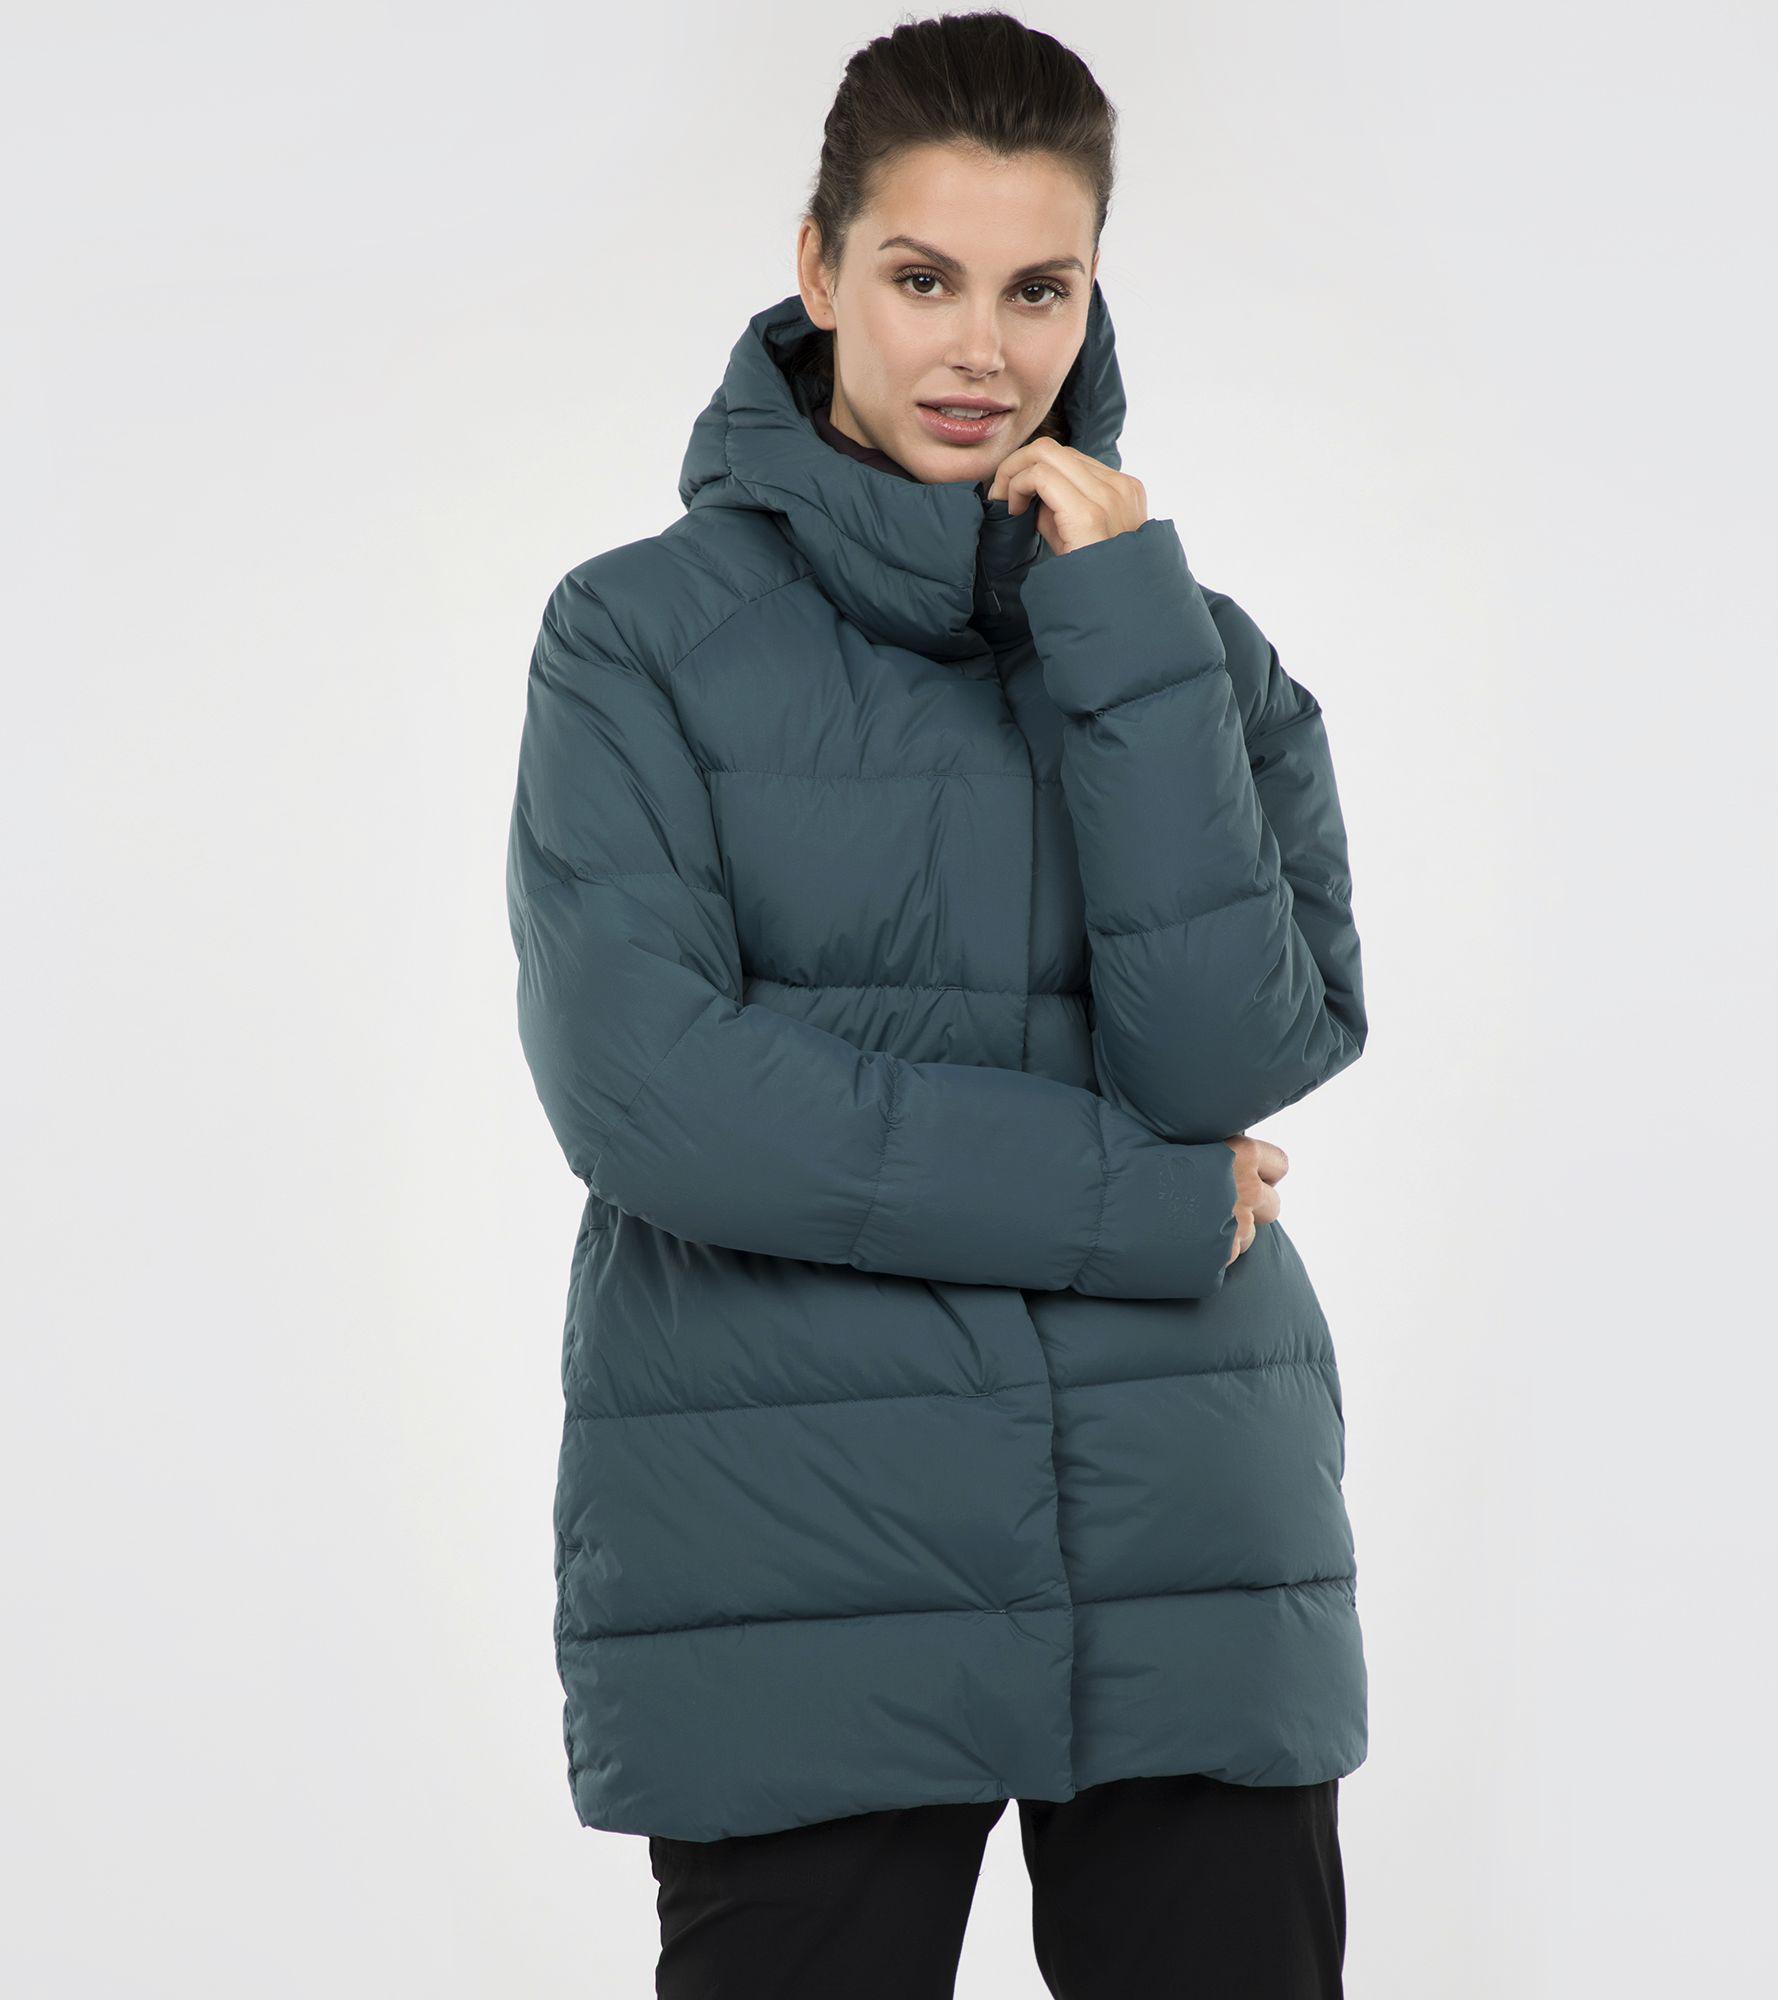 Mountain Hardwear Куртка пуховая женская Mountain Hardwear, размер 50 цены